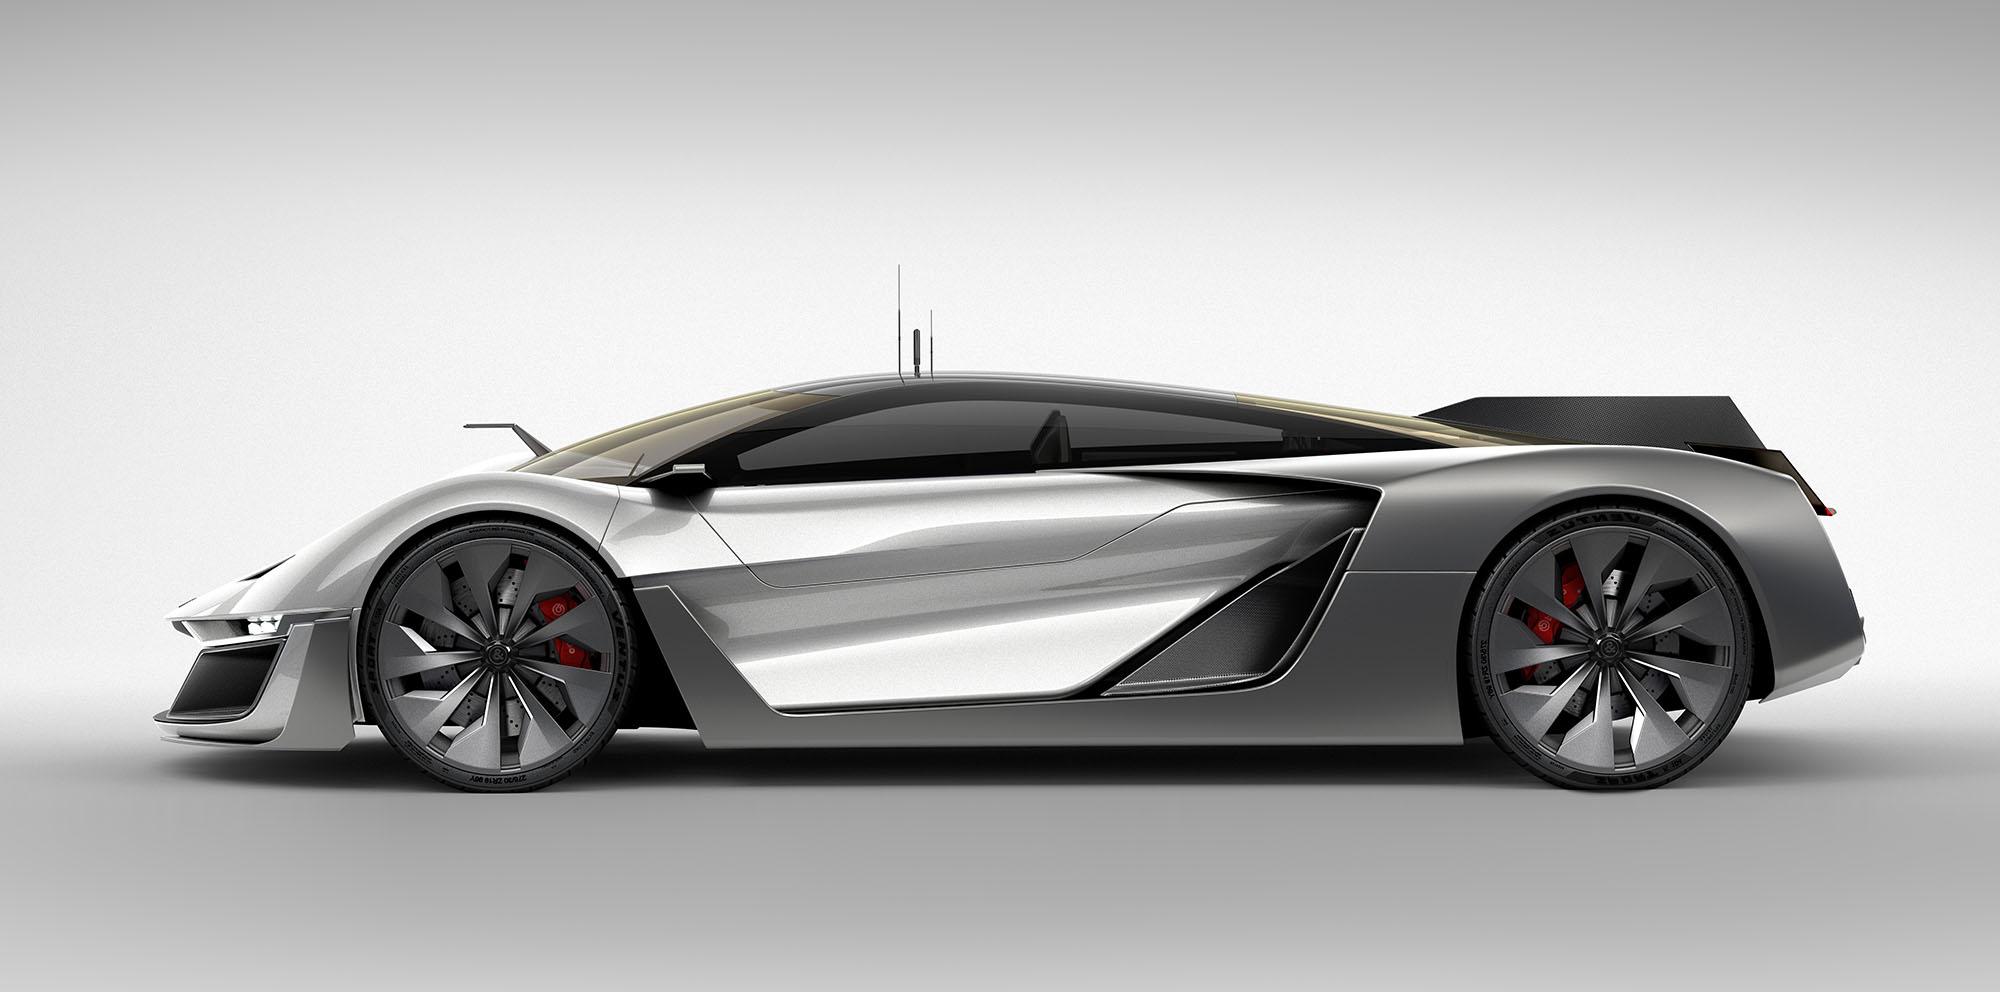 Bell & Ross Aero GT concept unveiled - photos | CarAdvice